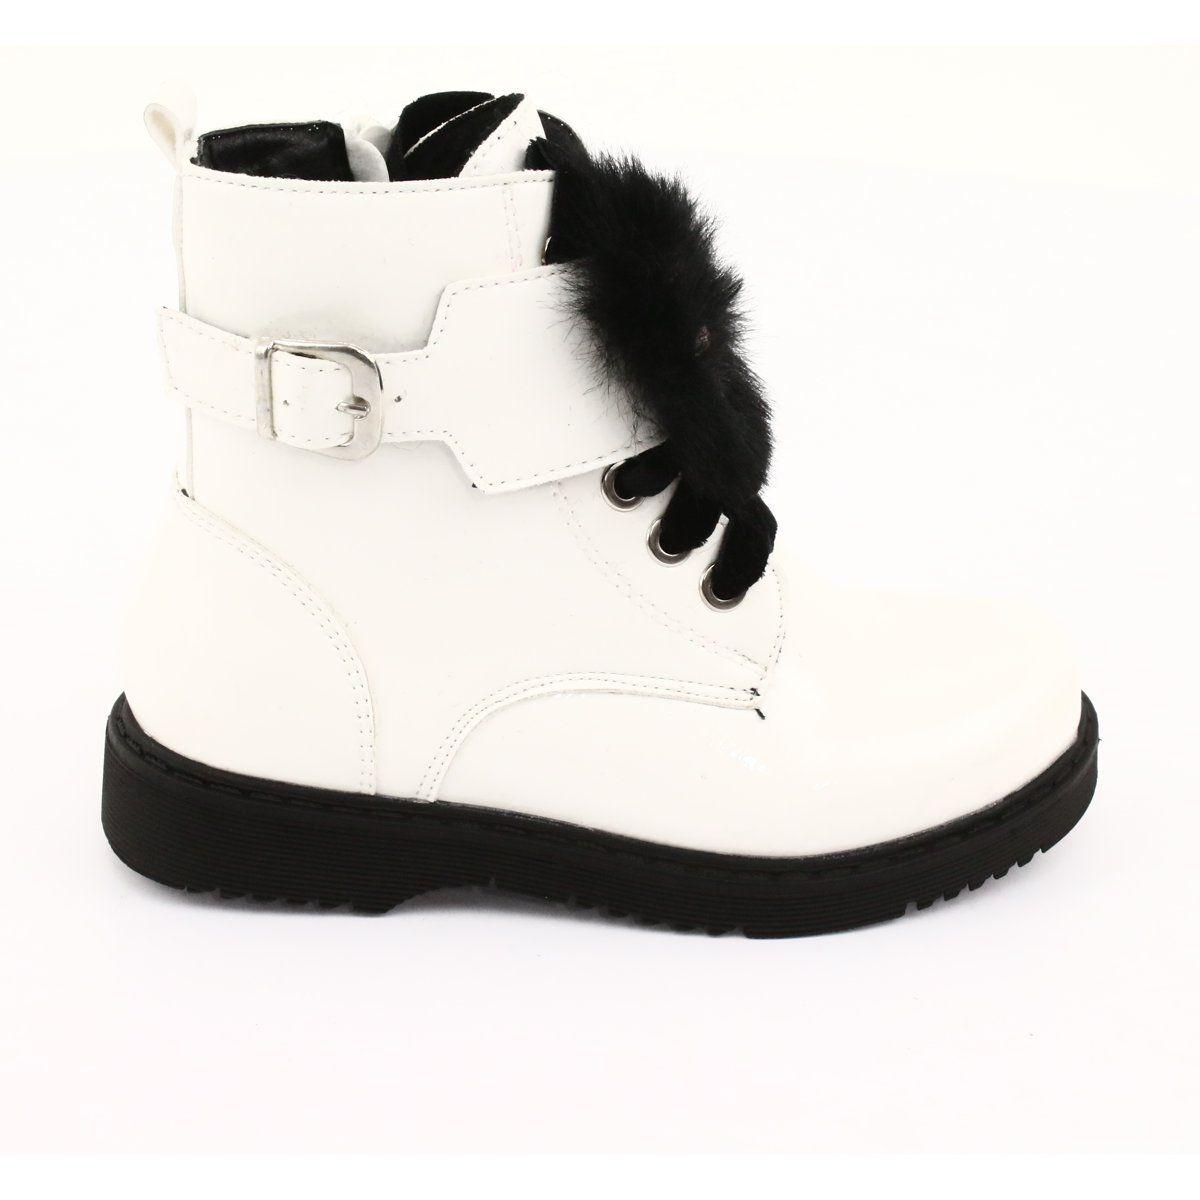 Glany Lakierowane Puszek Evento 1438 Biale Czarne Boots Childrens Boots Kid Shoes